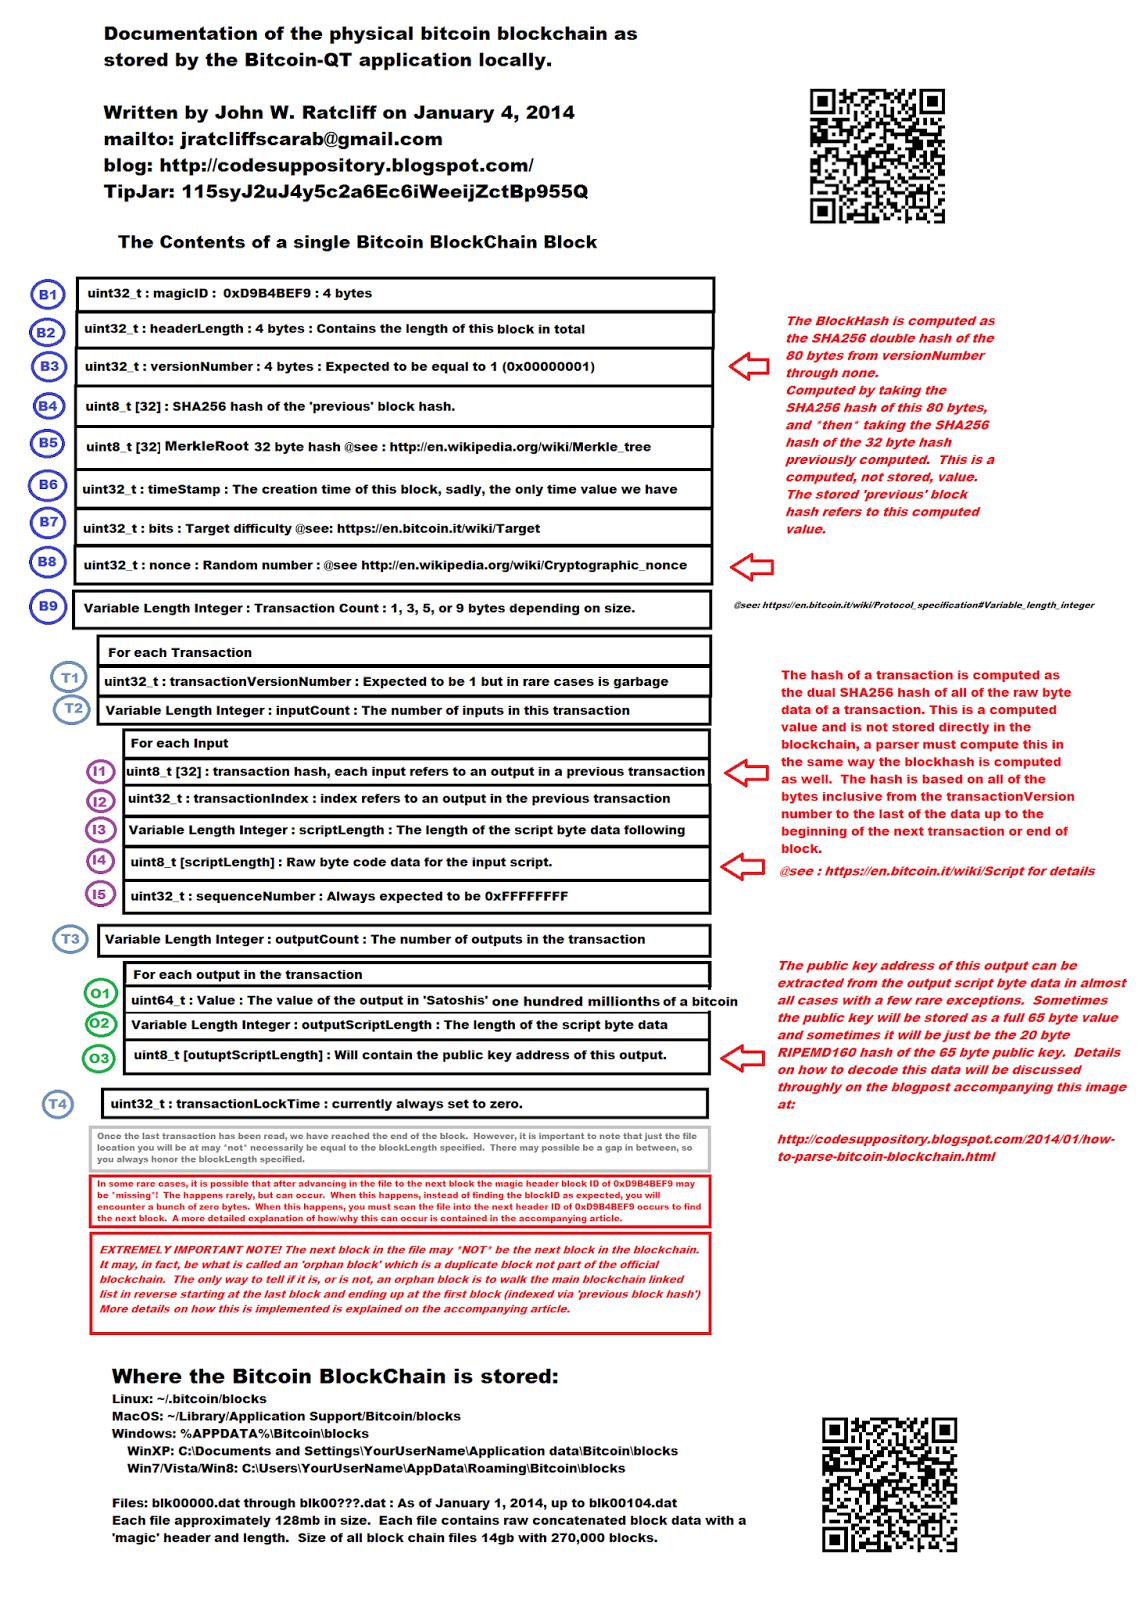 How to Parse the Bitcoin BlockChain | John Ratcliff's Code